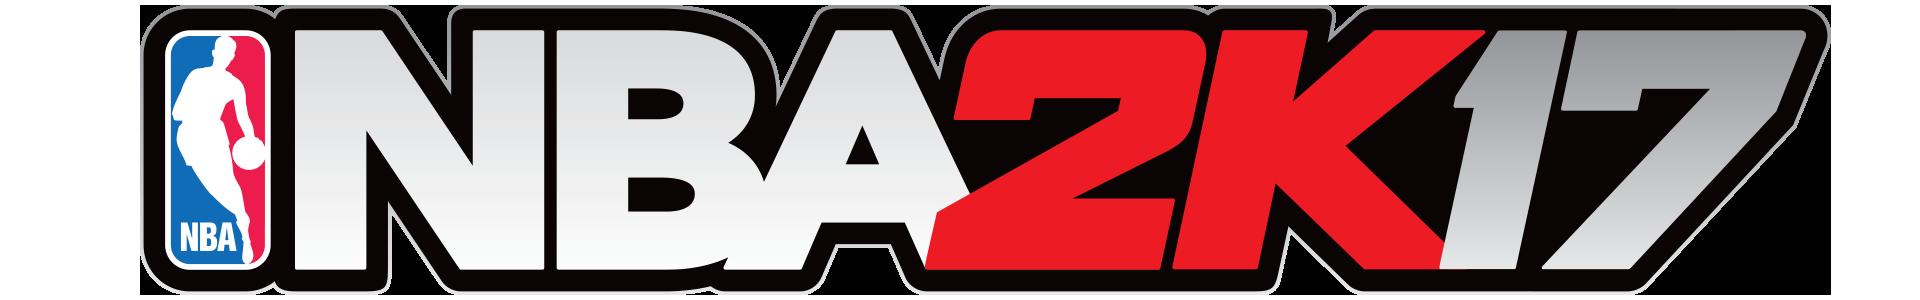 Nba 2k17 Logos.